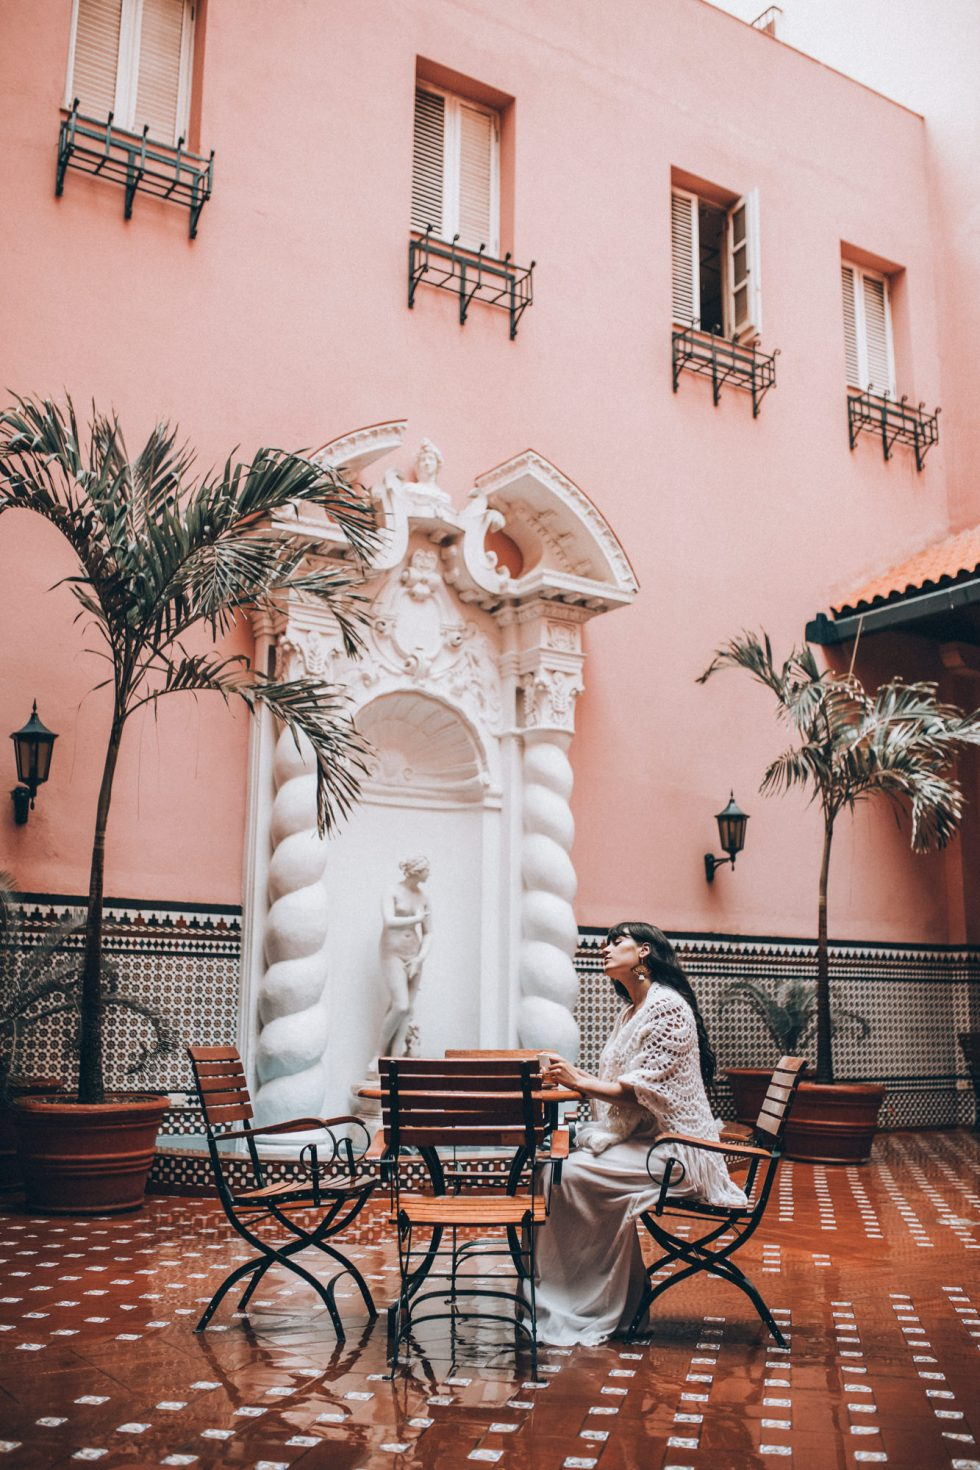 hotel-sevilla-havana-cuba-travel-lifestyle-photographer-laura-g-diaz